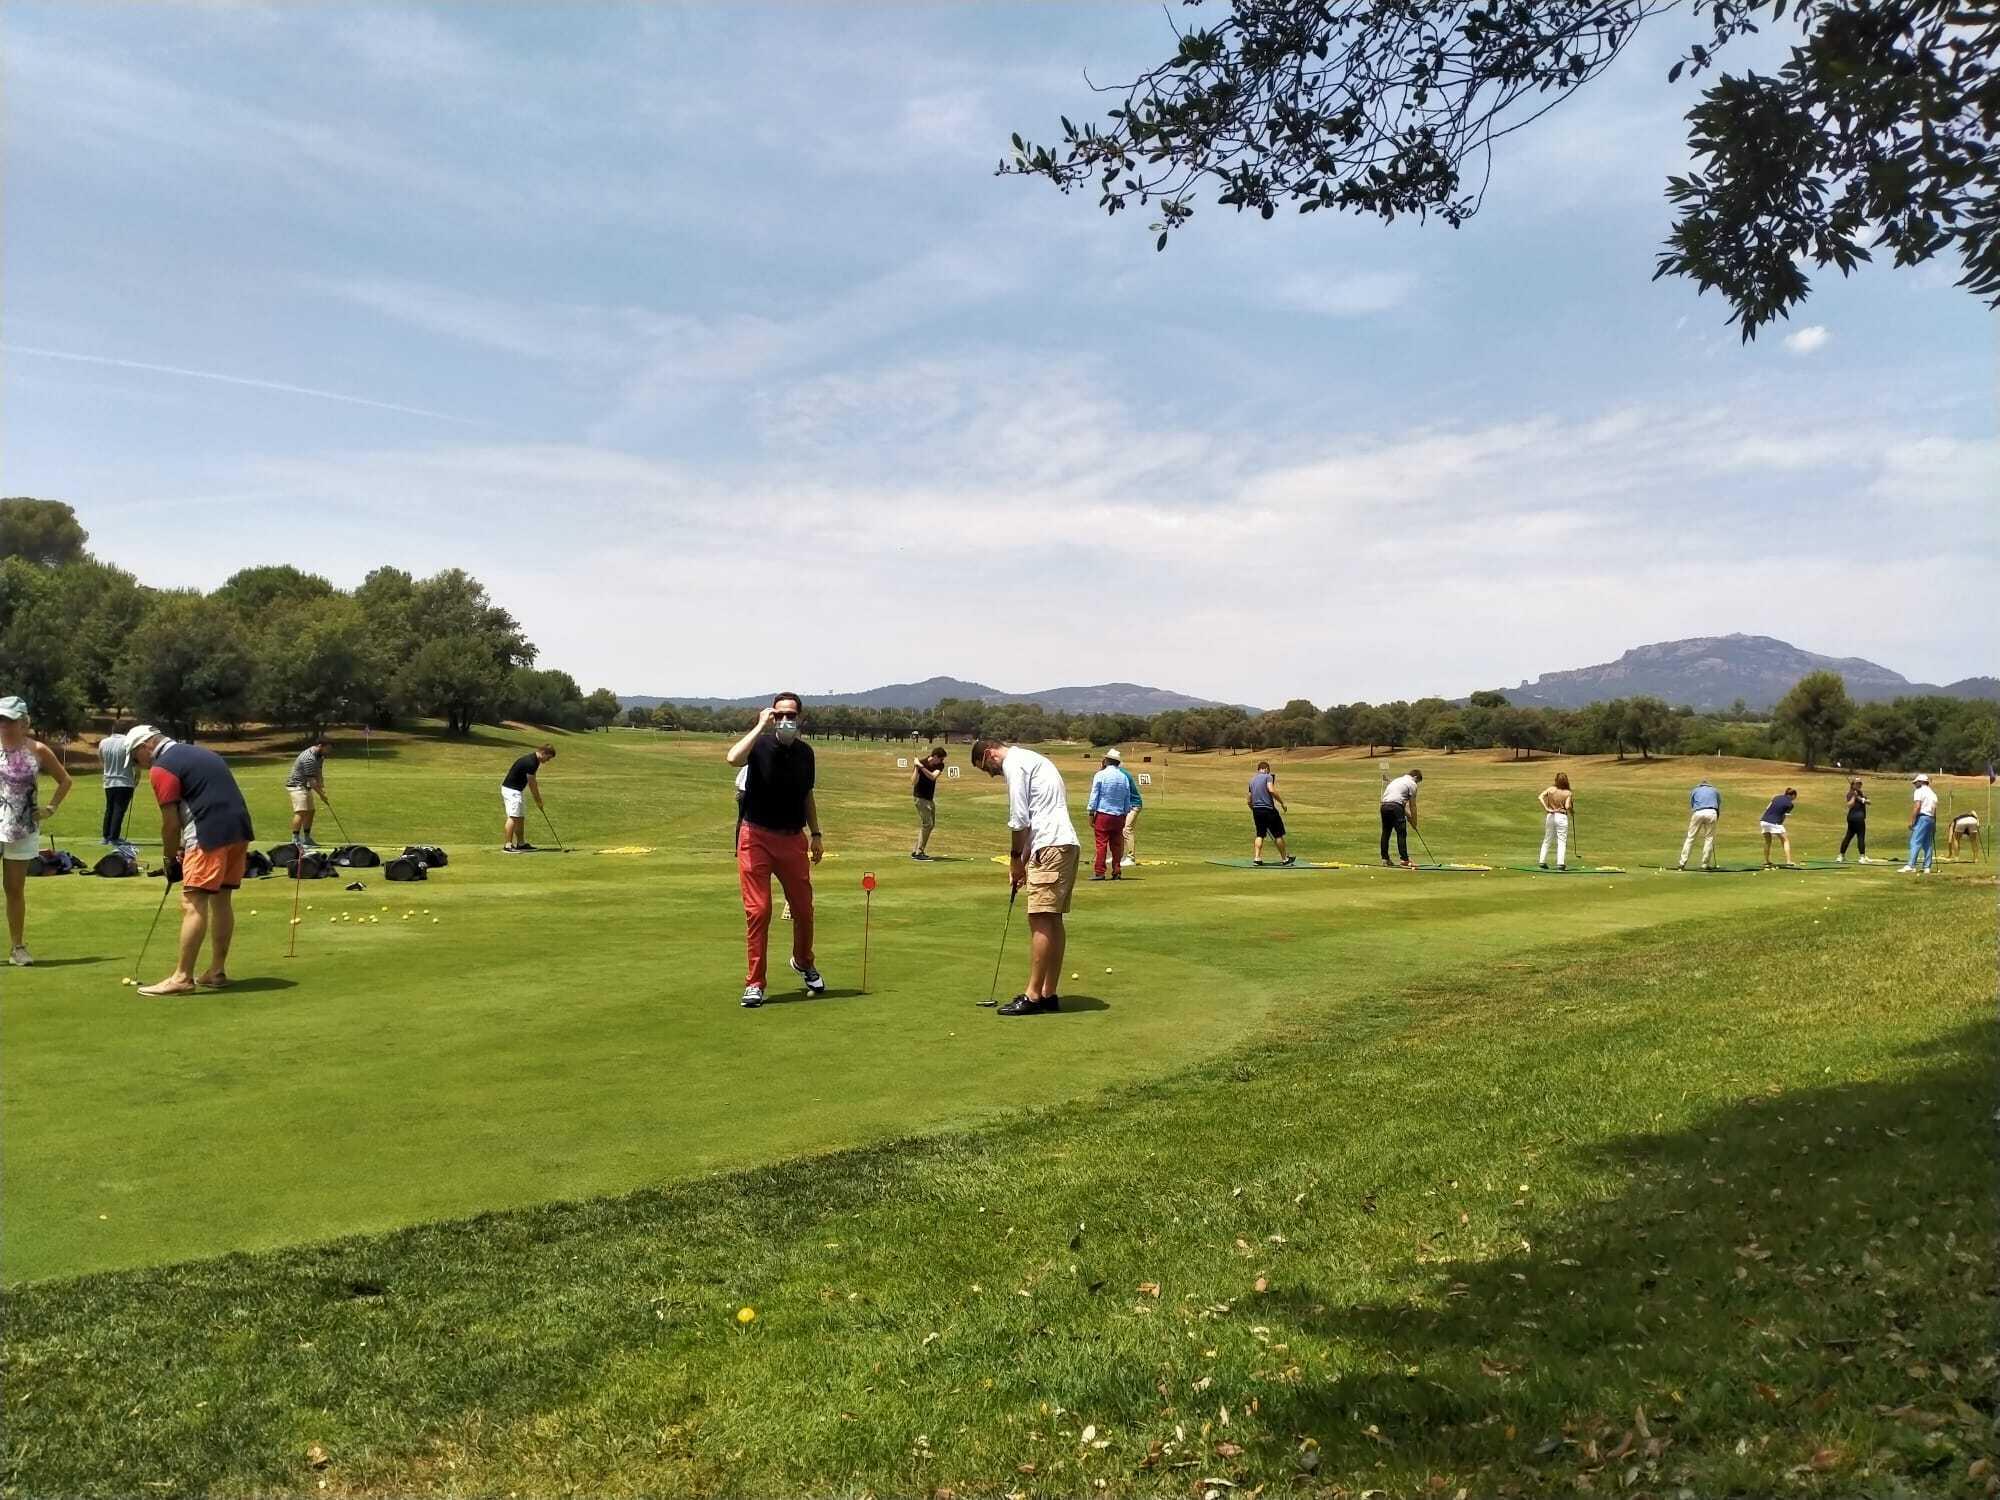 Tournoi de golf en Espagne